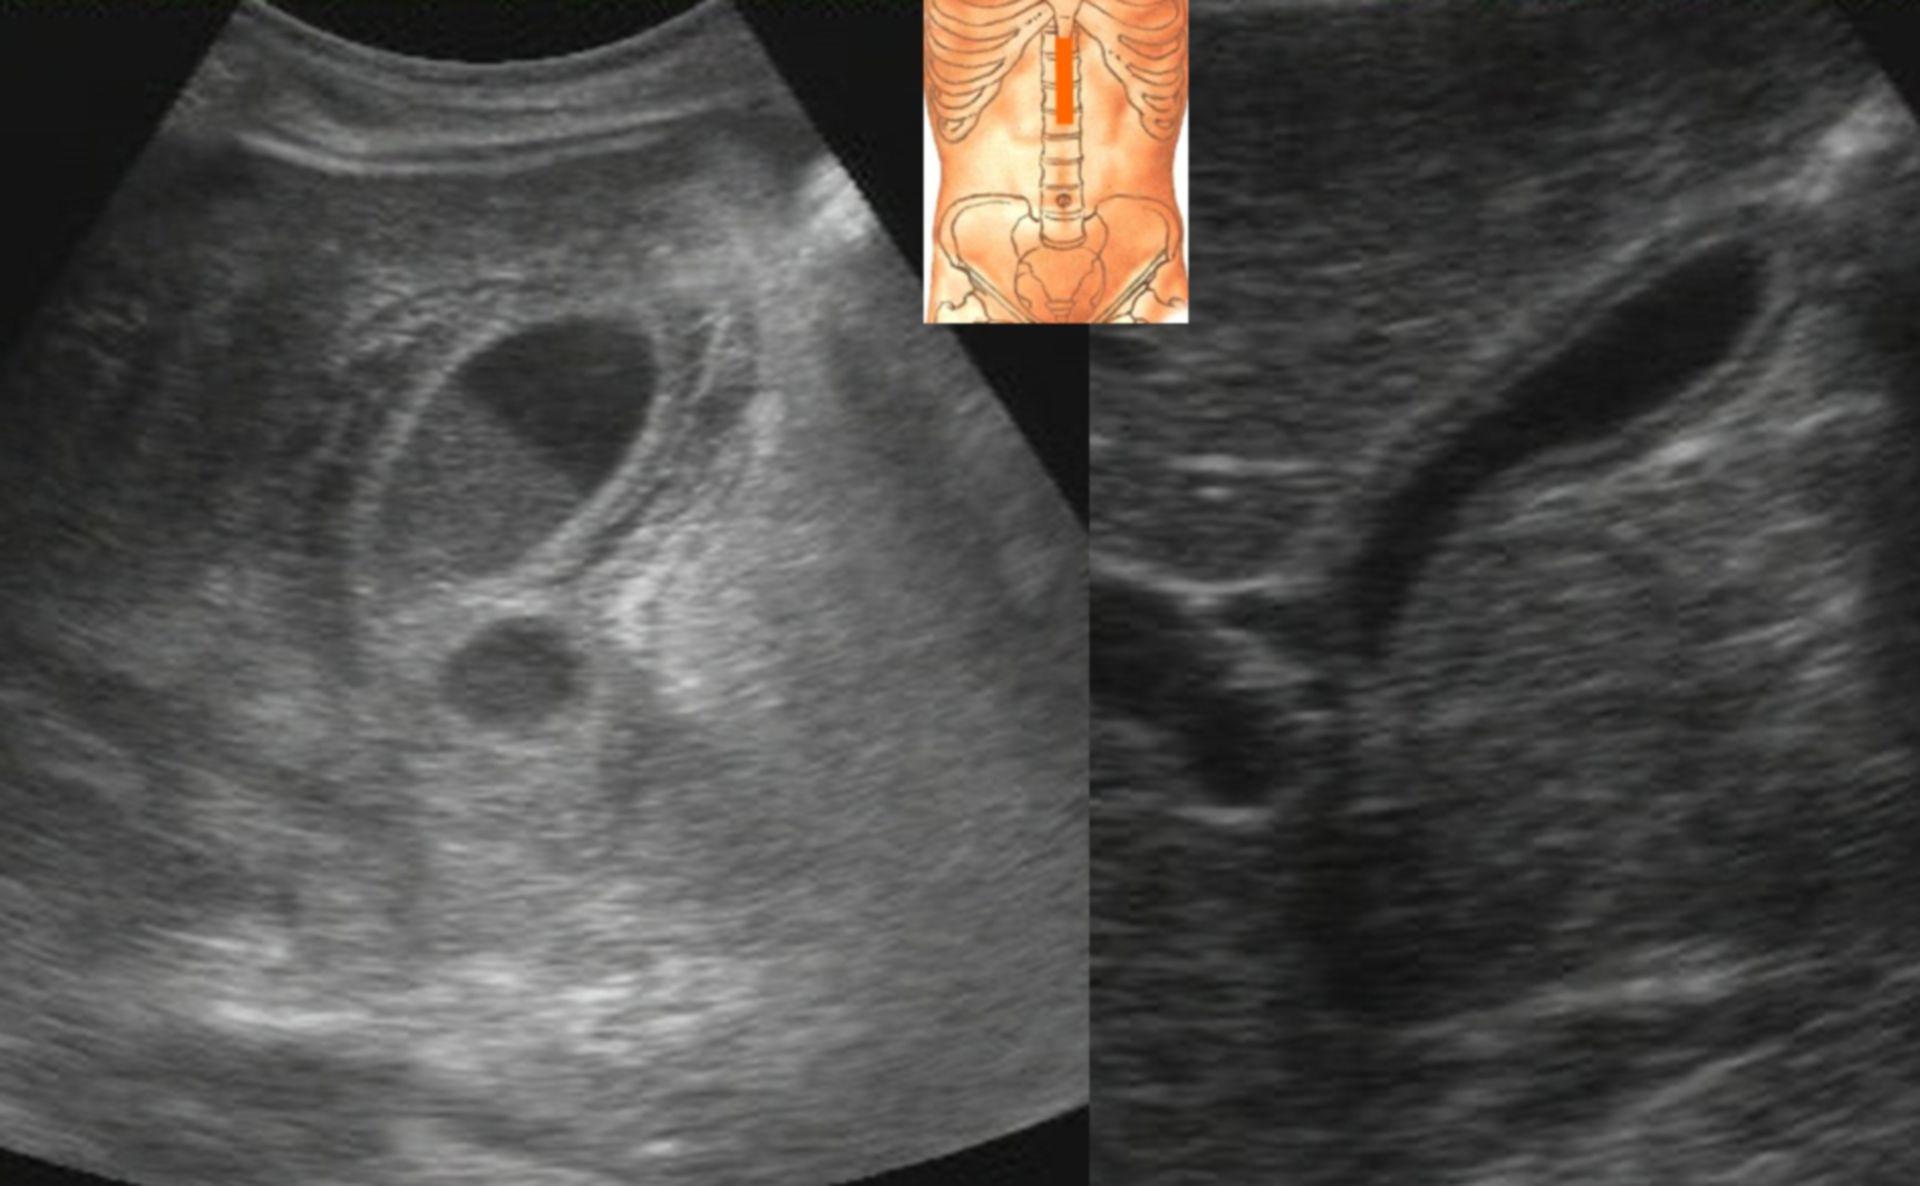 Postprandial gallbladder